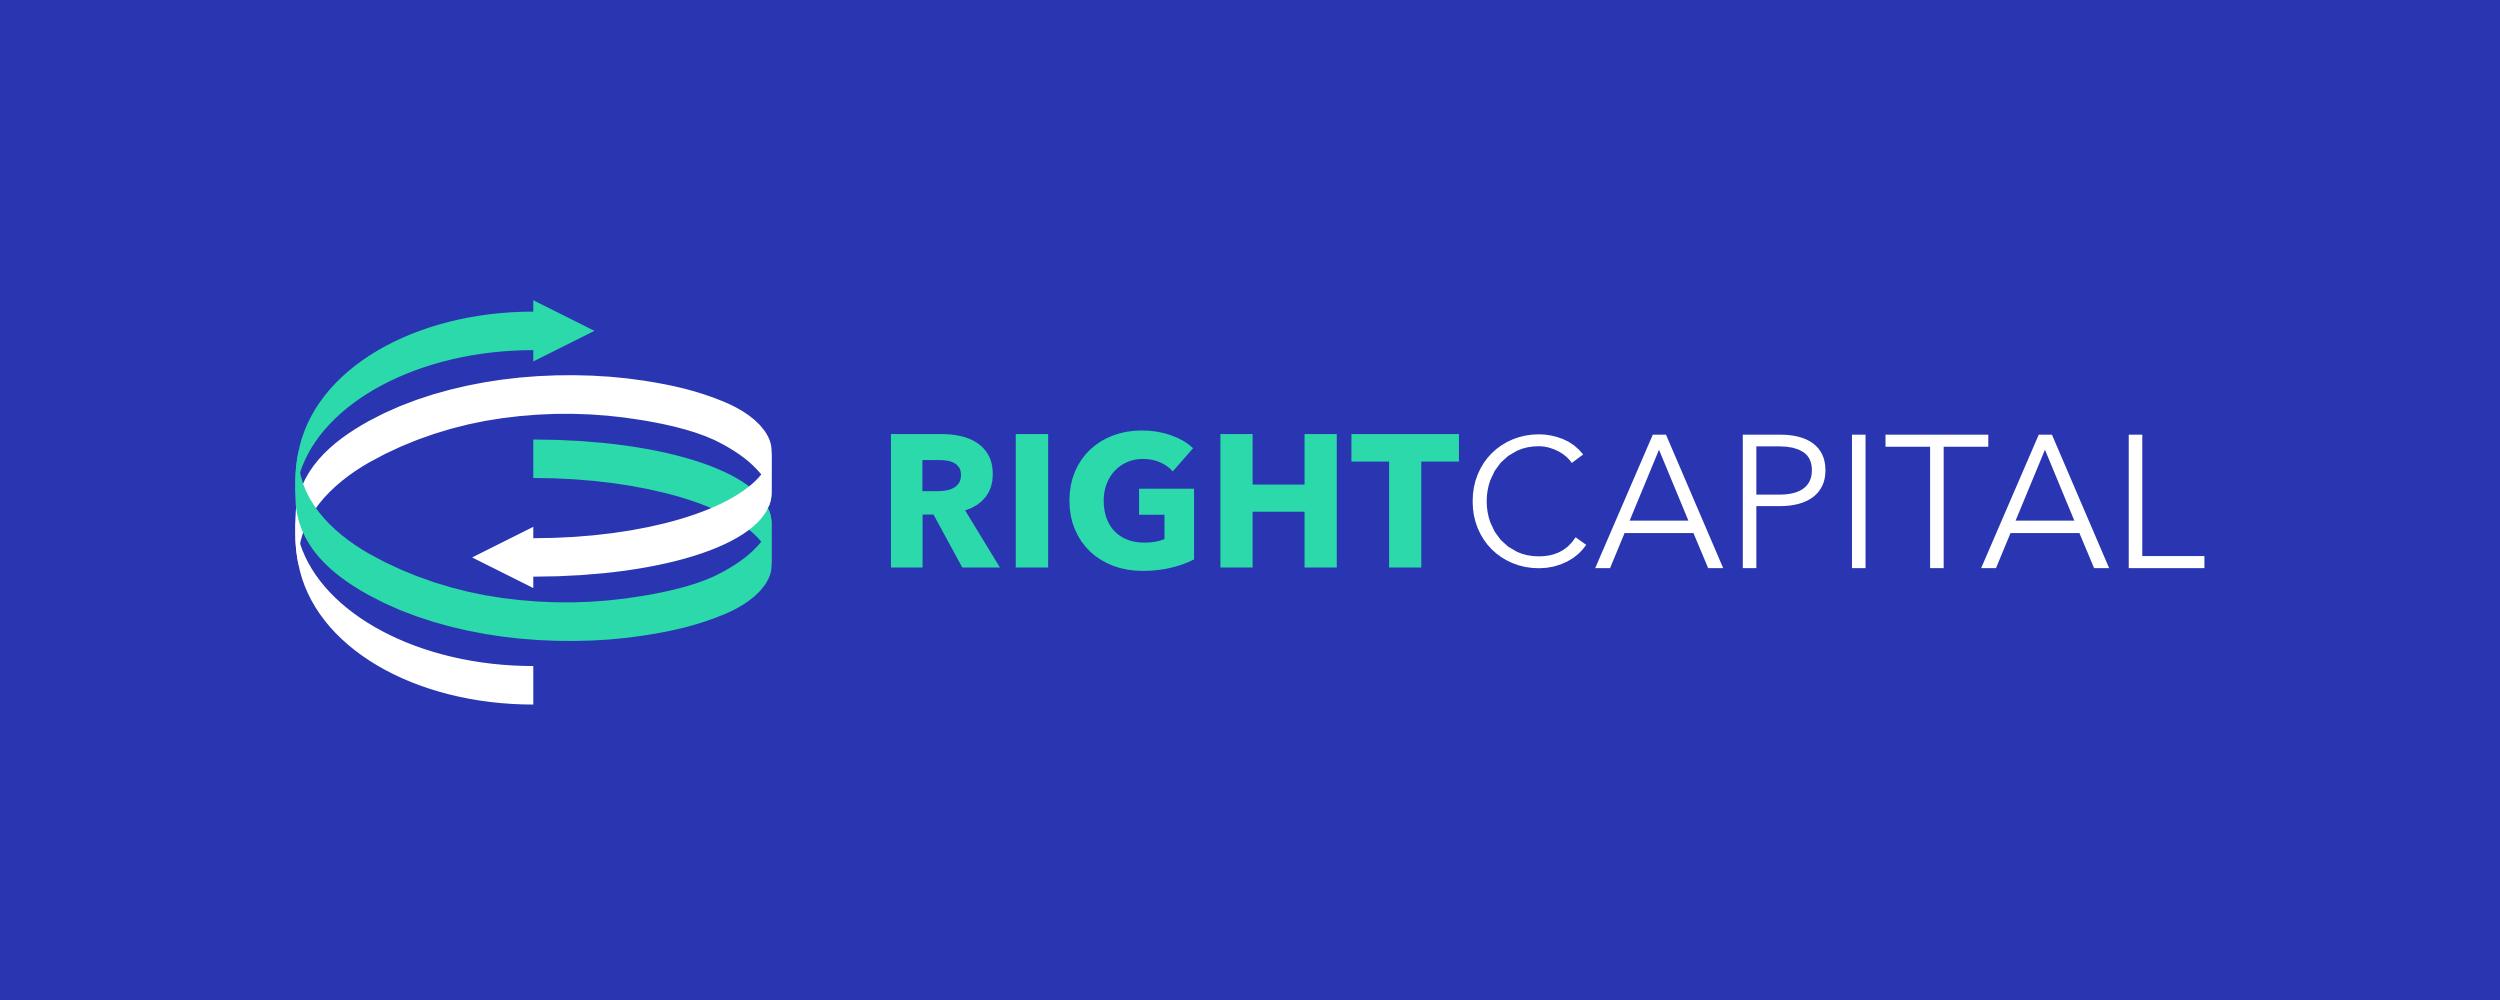 Right Capital logo Rochester, MN PharmD Financial Planning, LLC